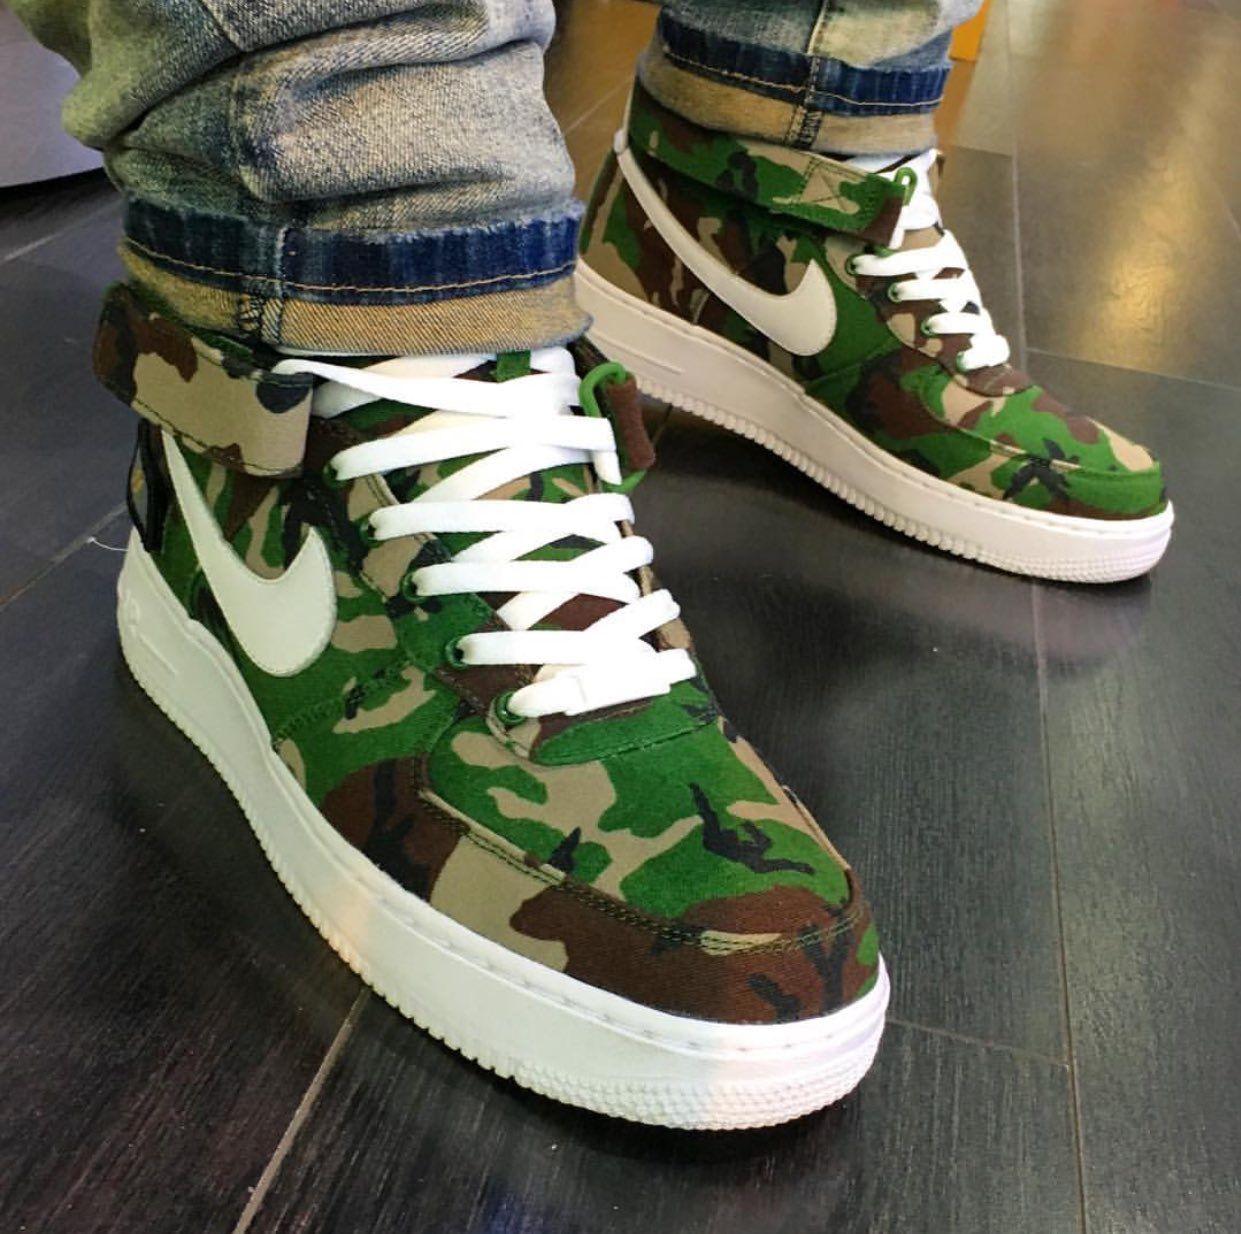 best service e323a 98caf Discover ideas about Nike Air Jordans